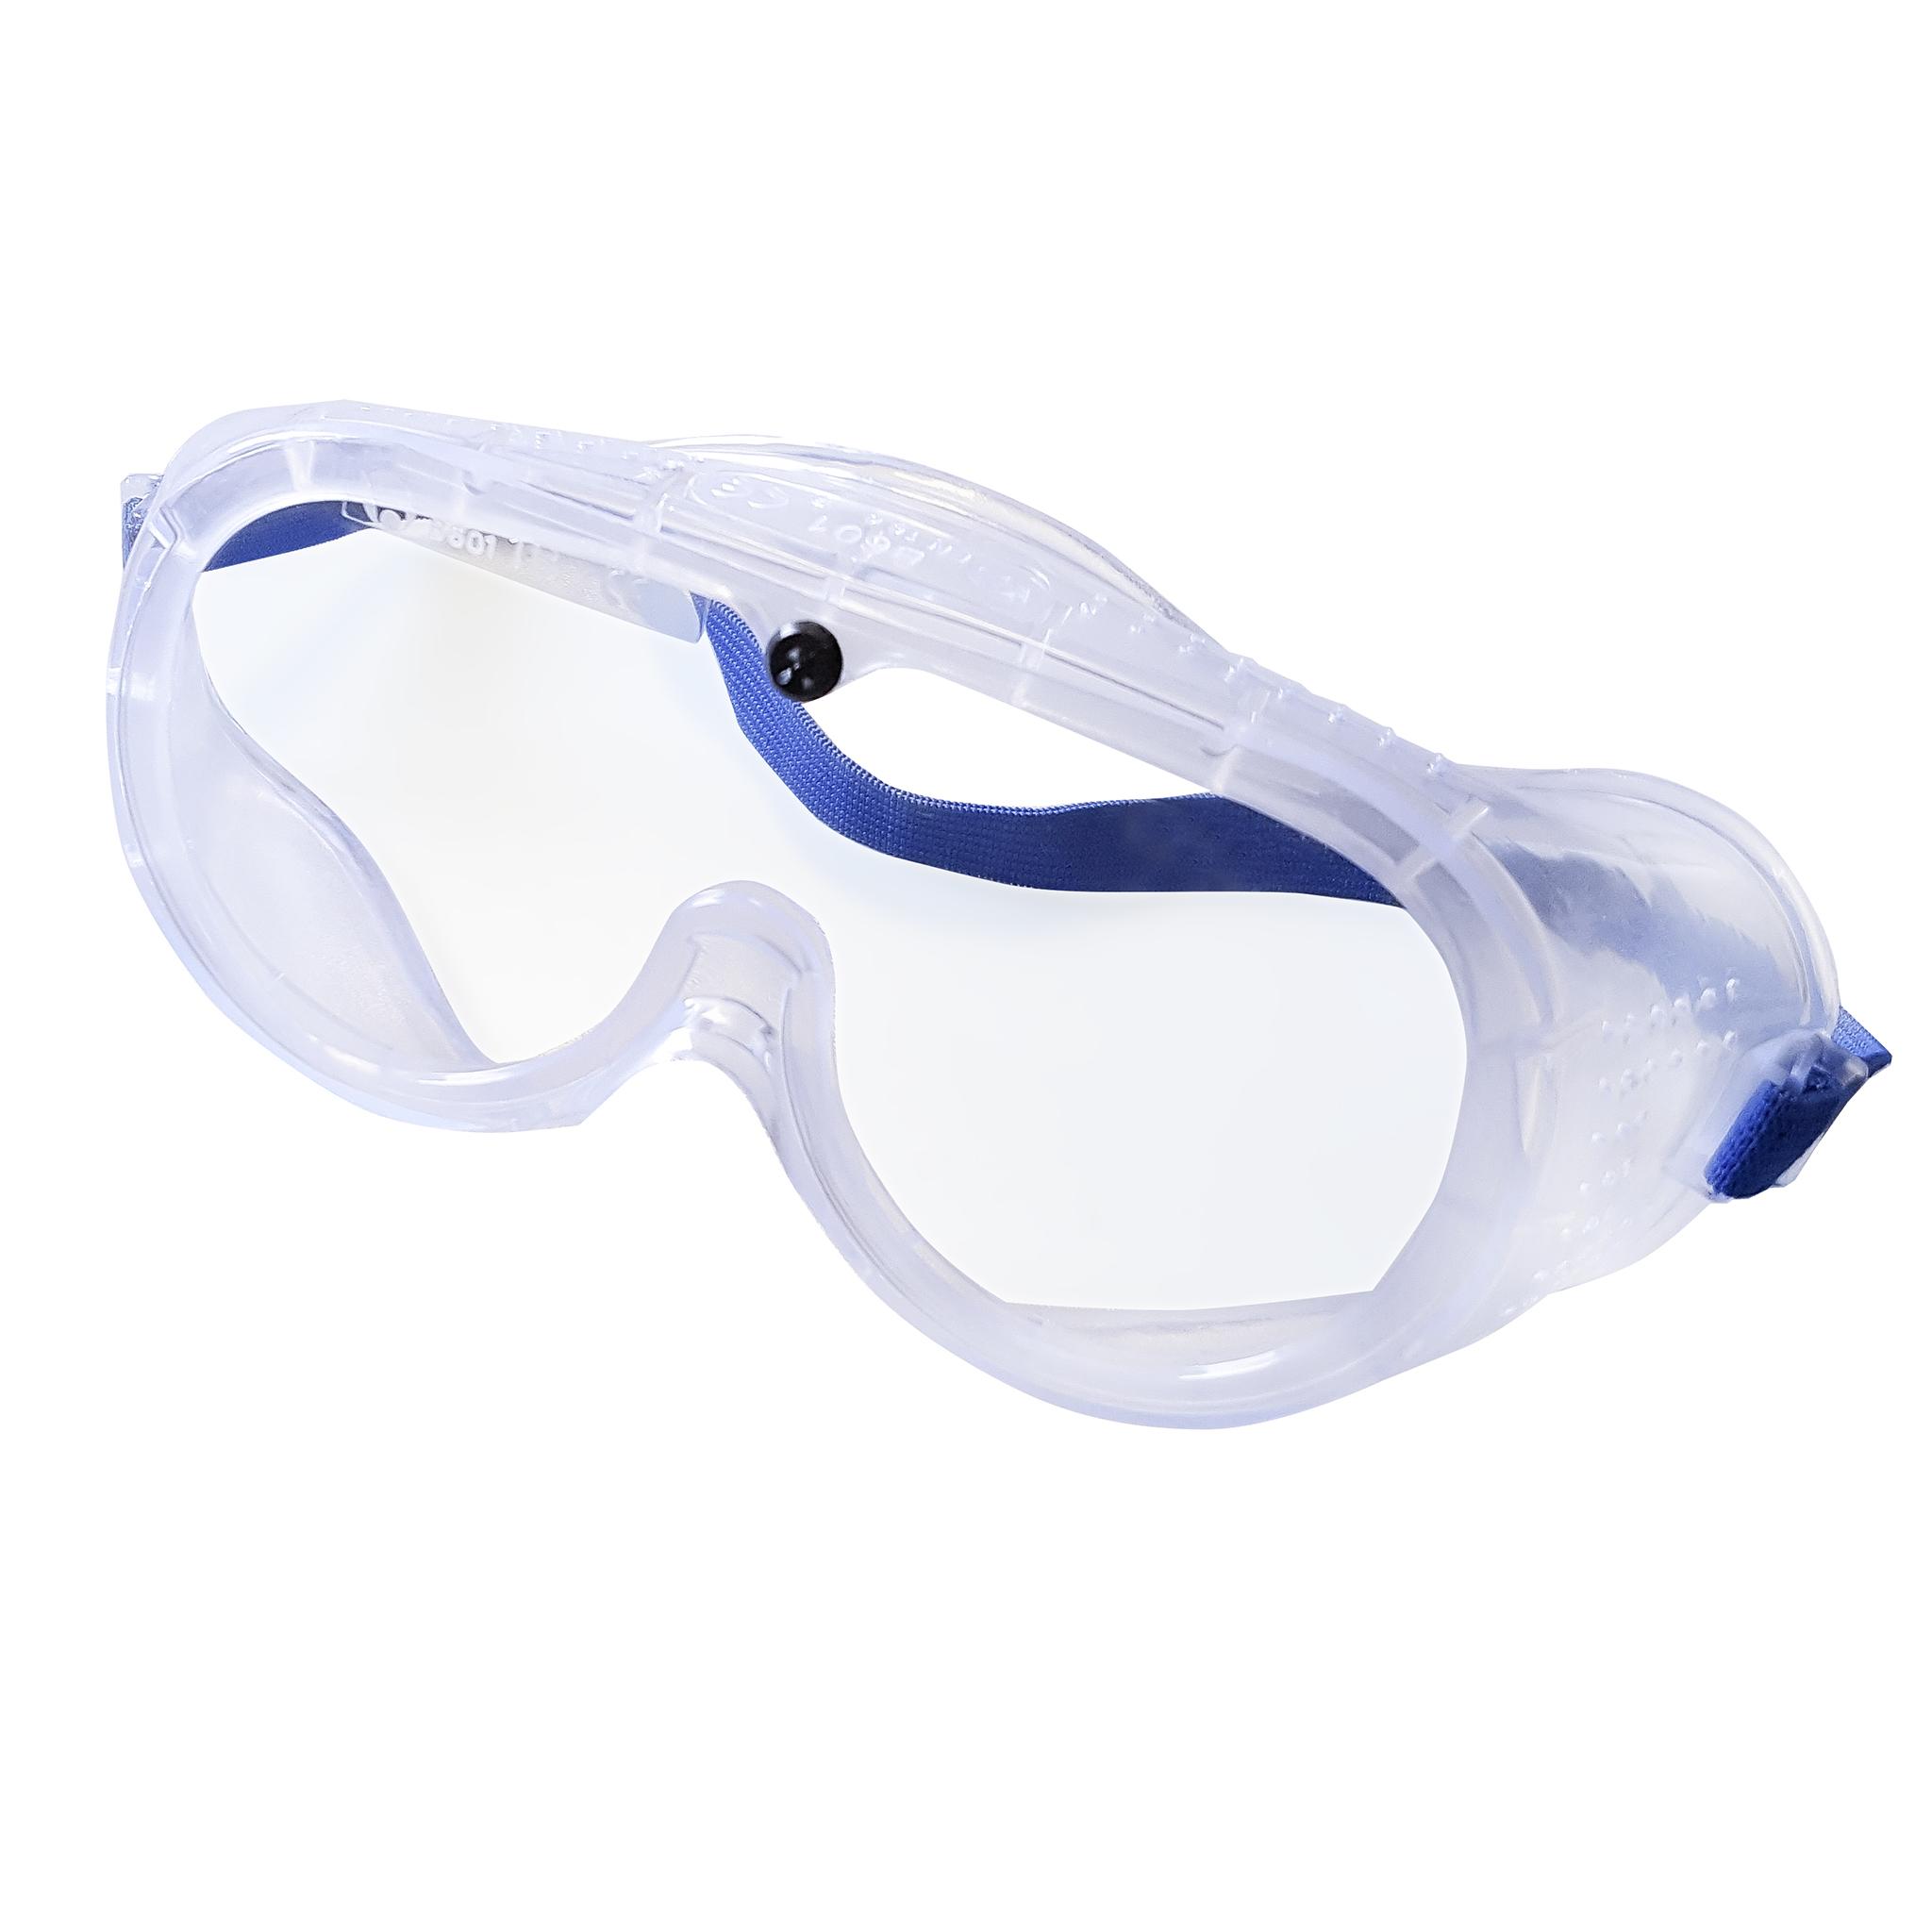 Riethmüller Schutzbrille, SB-verpackt